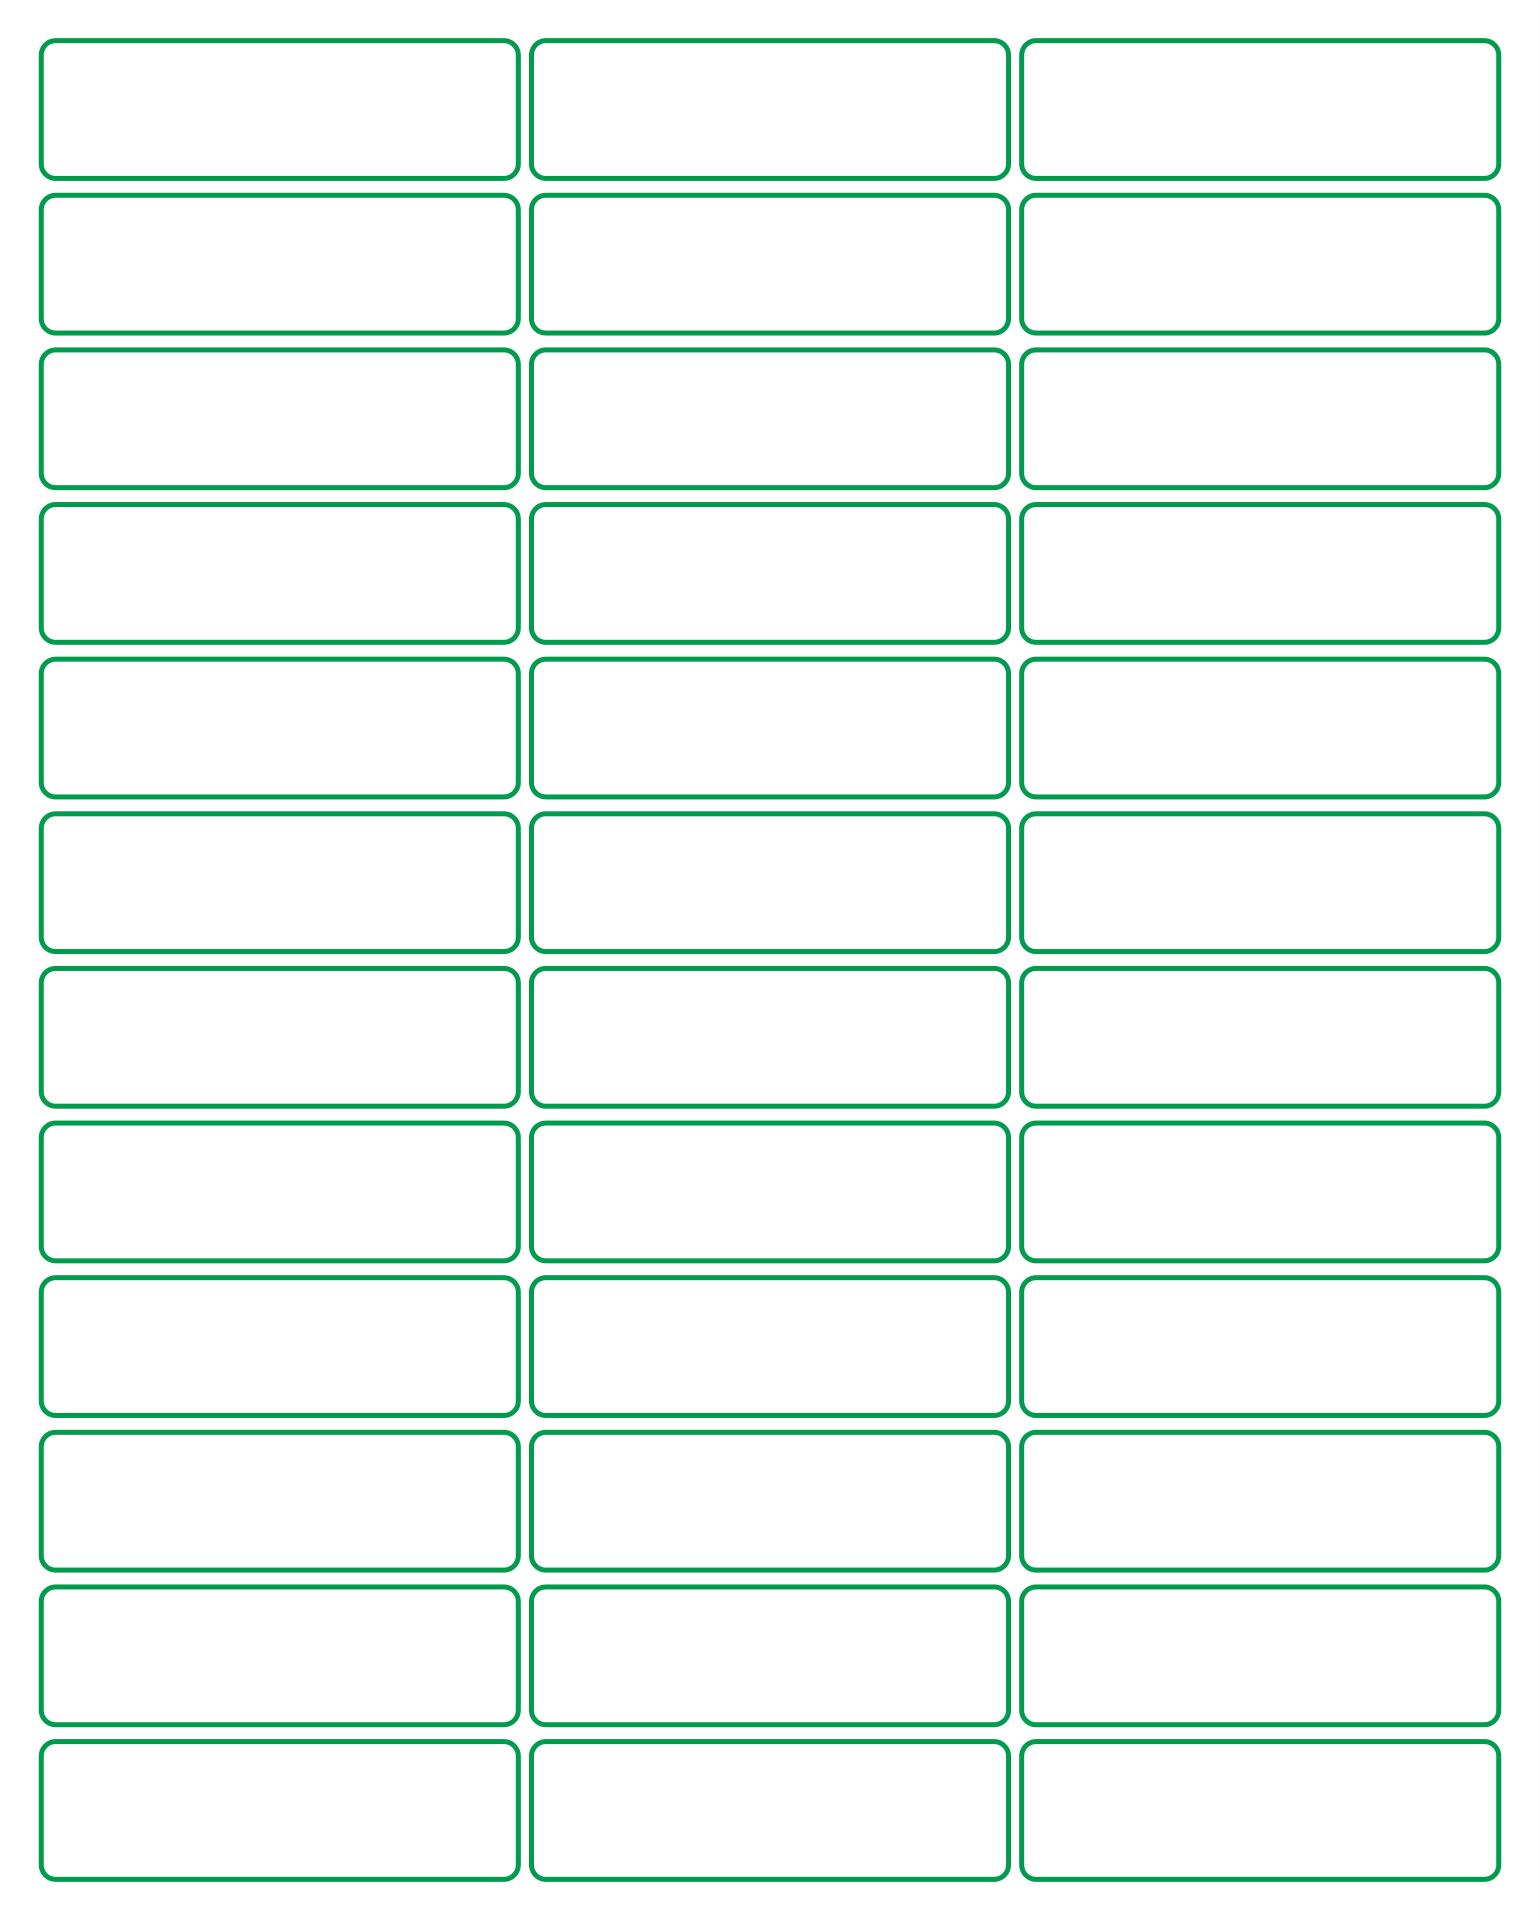 Pendaflex Printable Tab Inserts Template